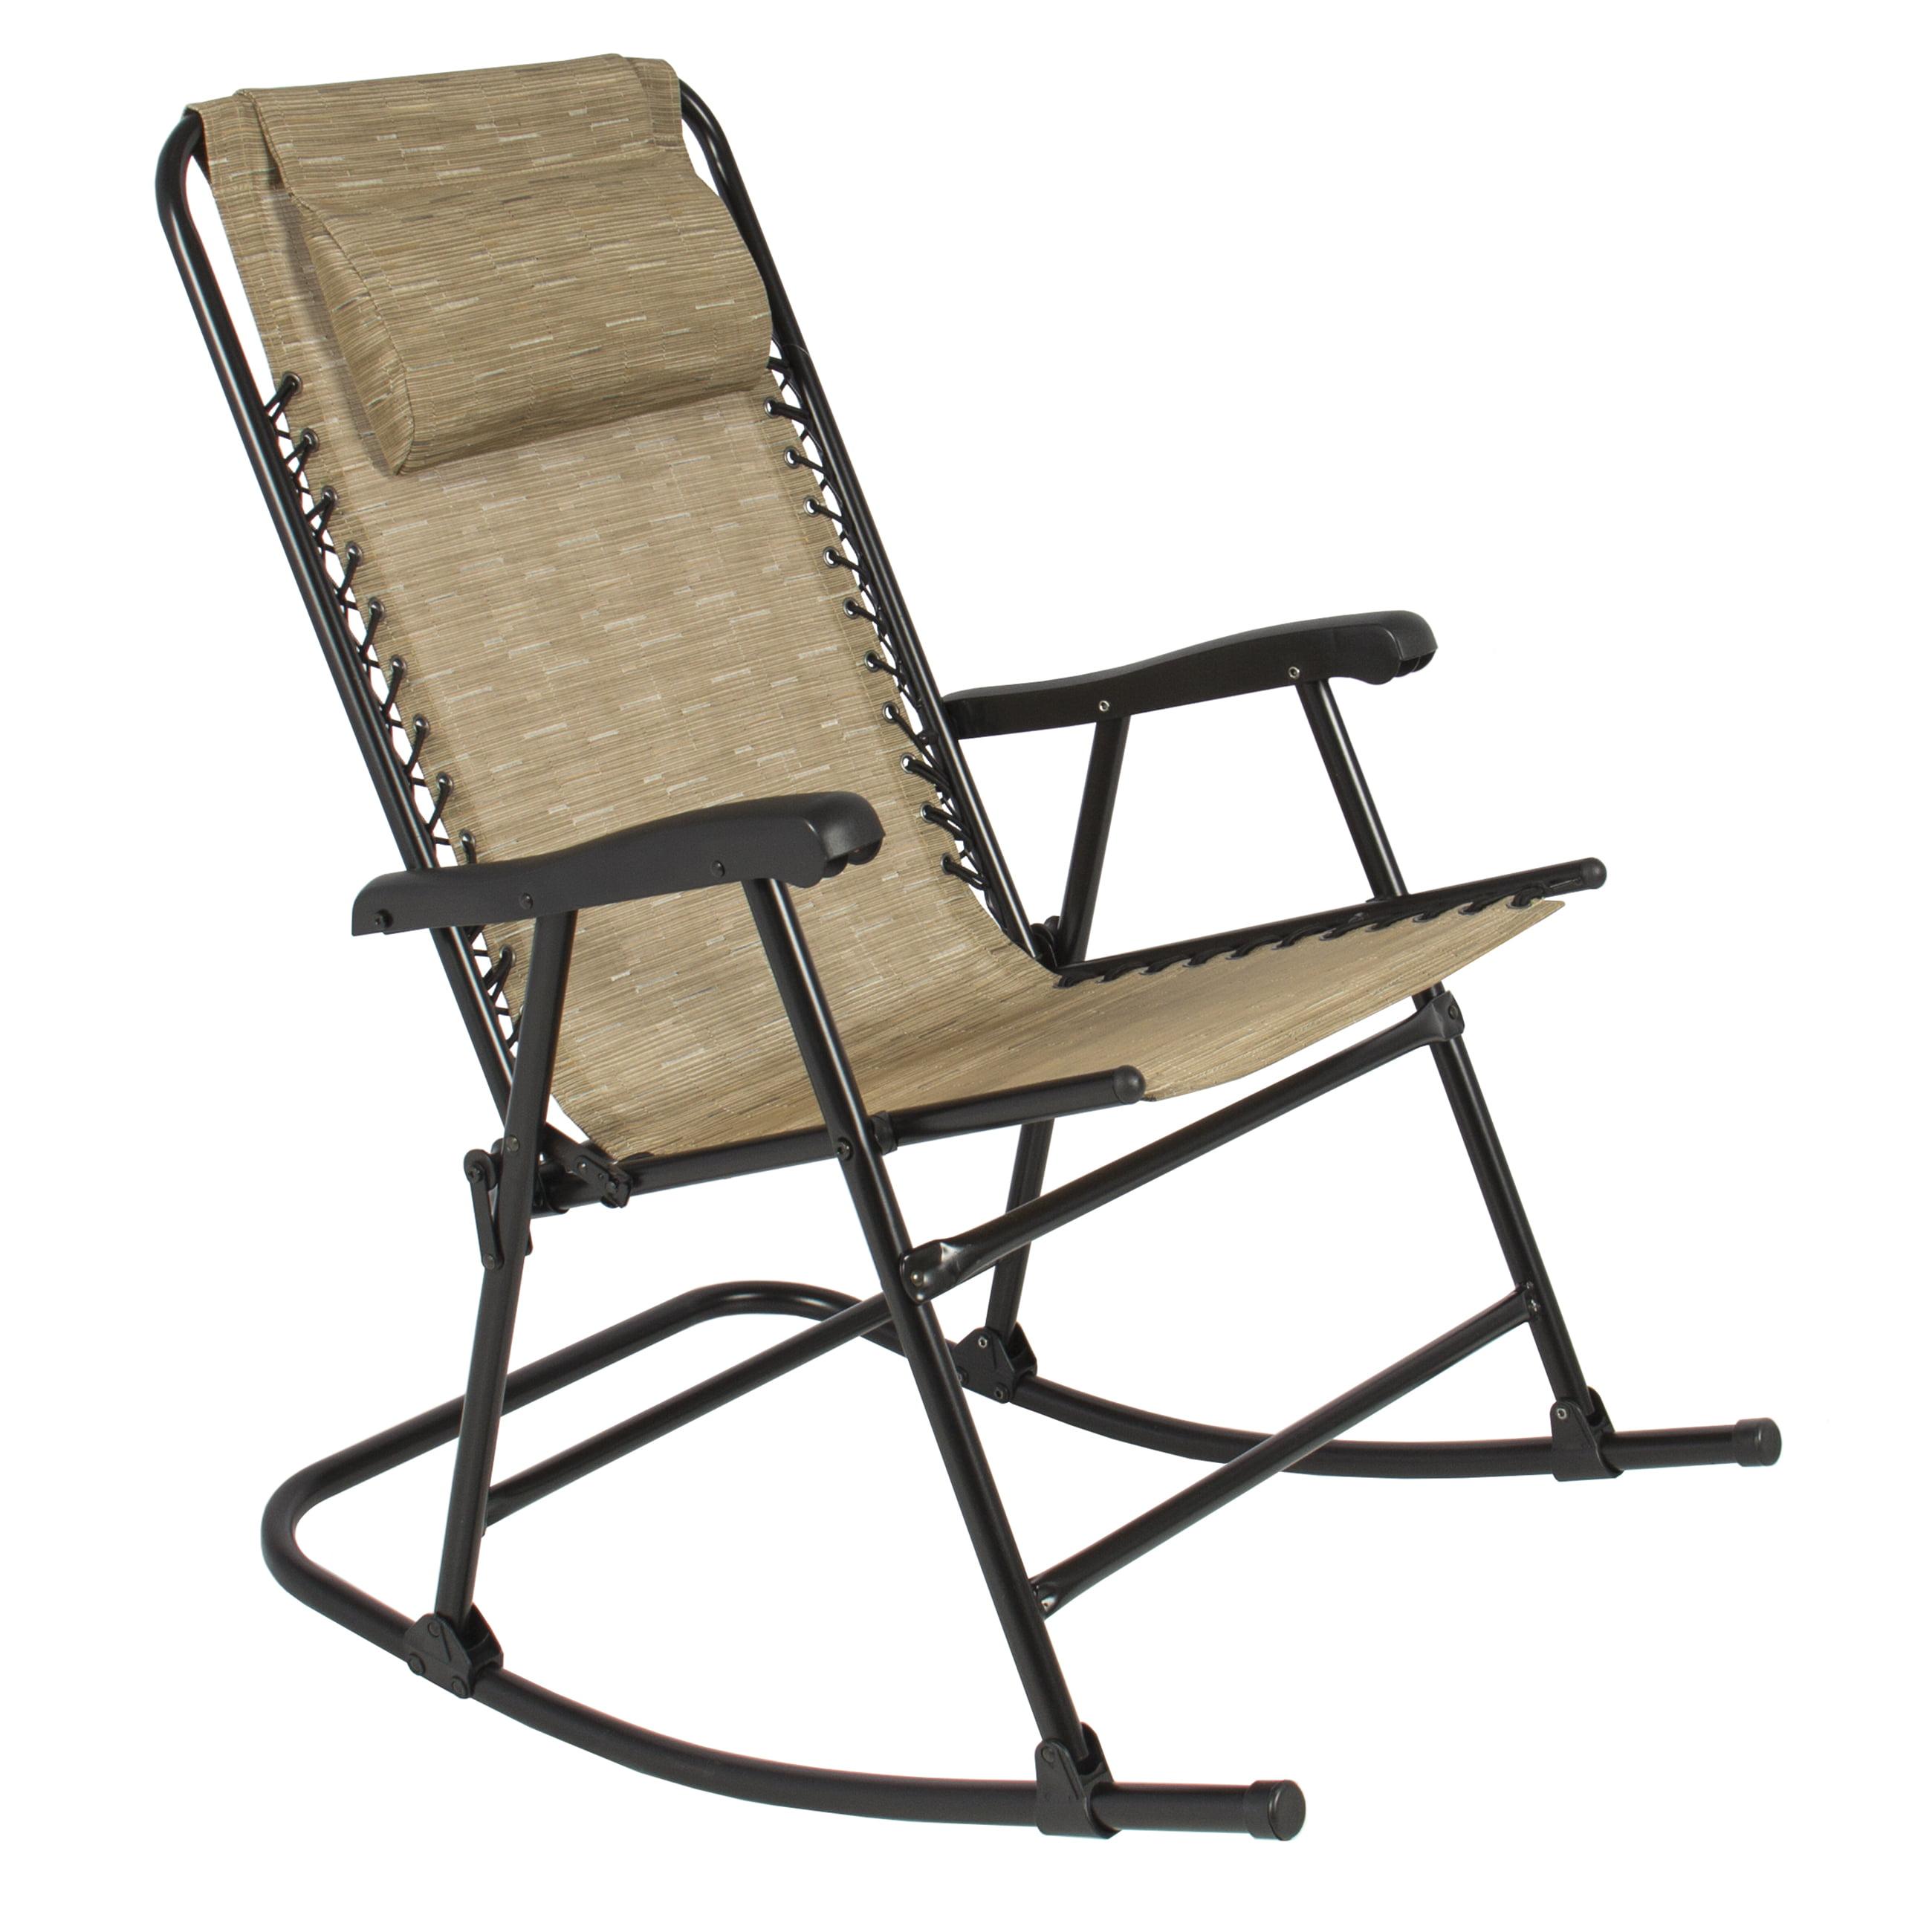 Best Choice Products Folding Rocking Chair Foldable Rocker Outdoor Patio  Furniture Beige   Walmart.com